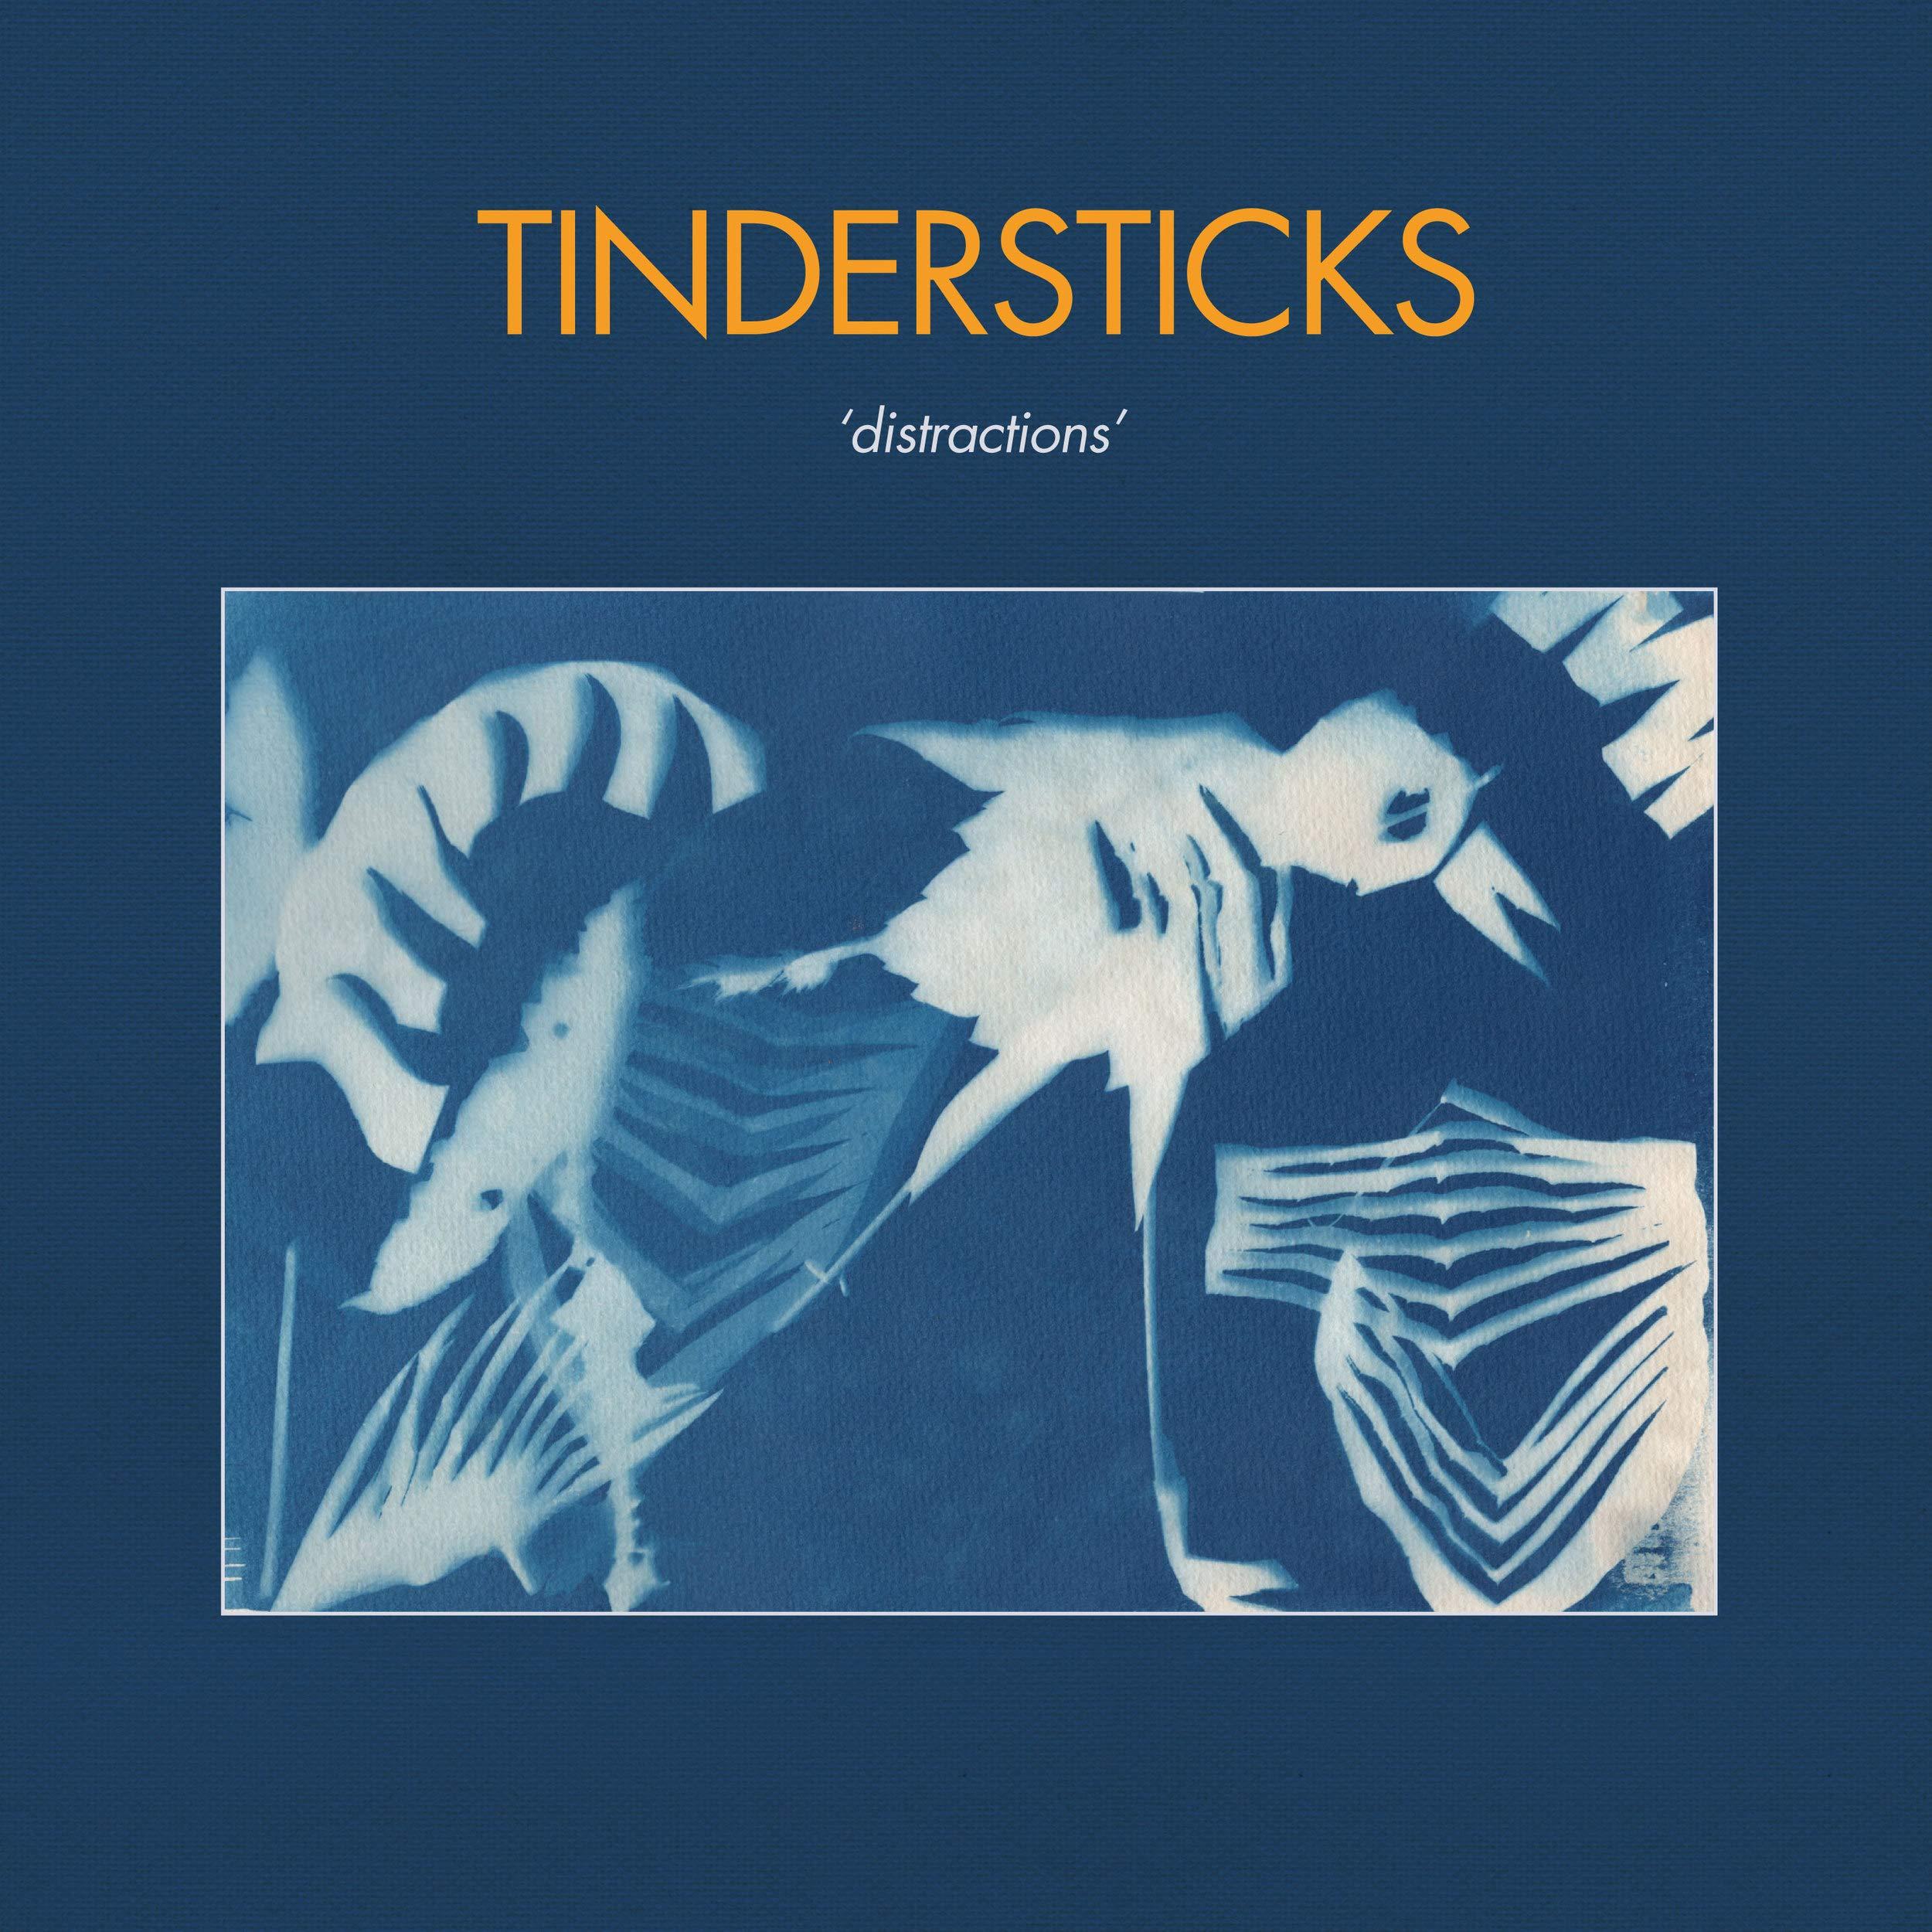 Tindersticks – Distractions (2021) [FLAC]